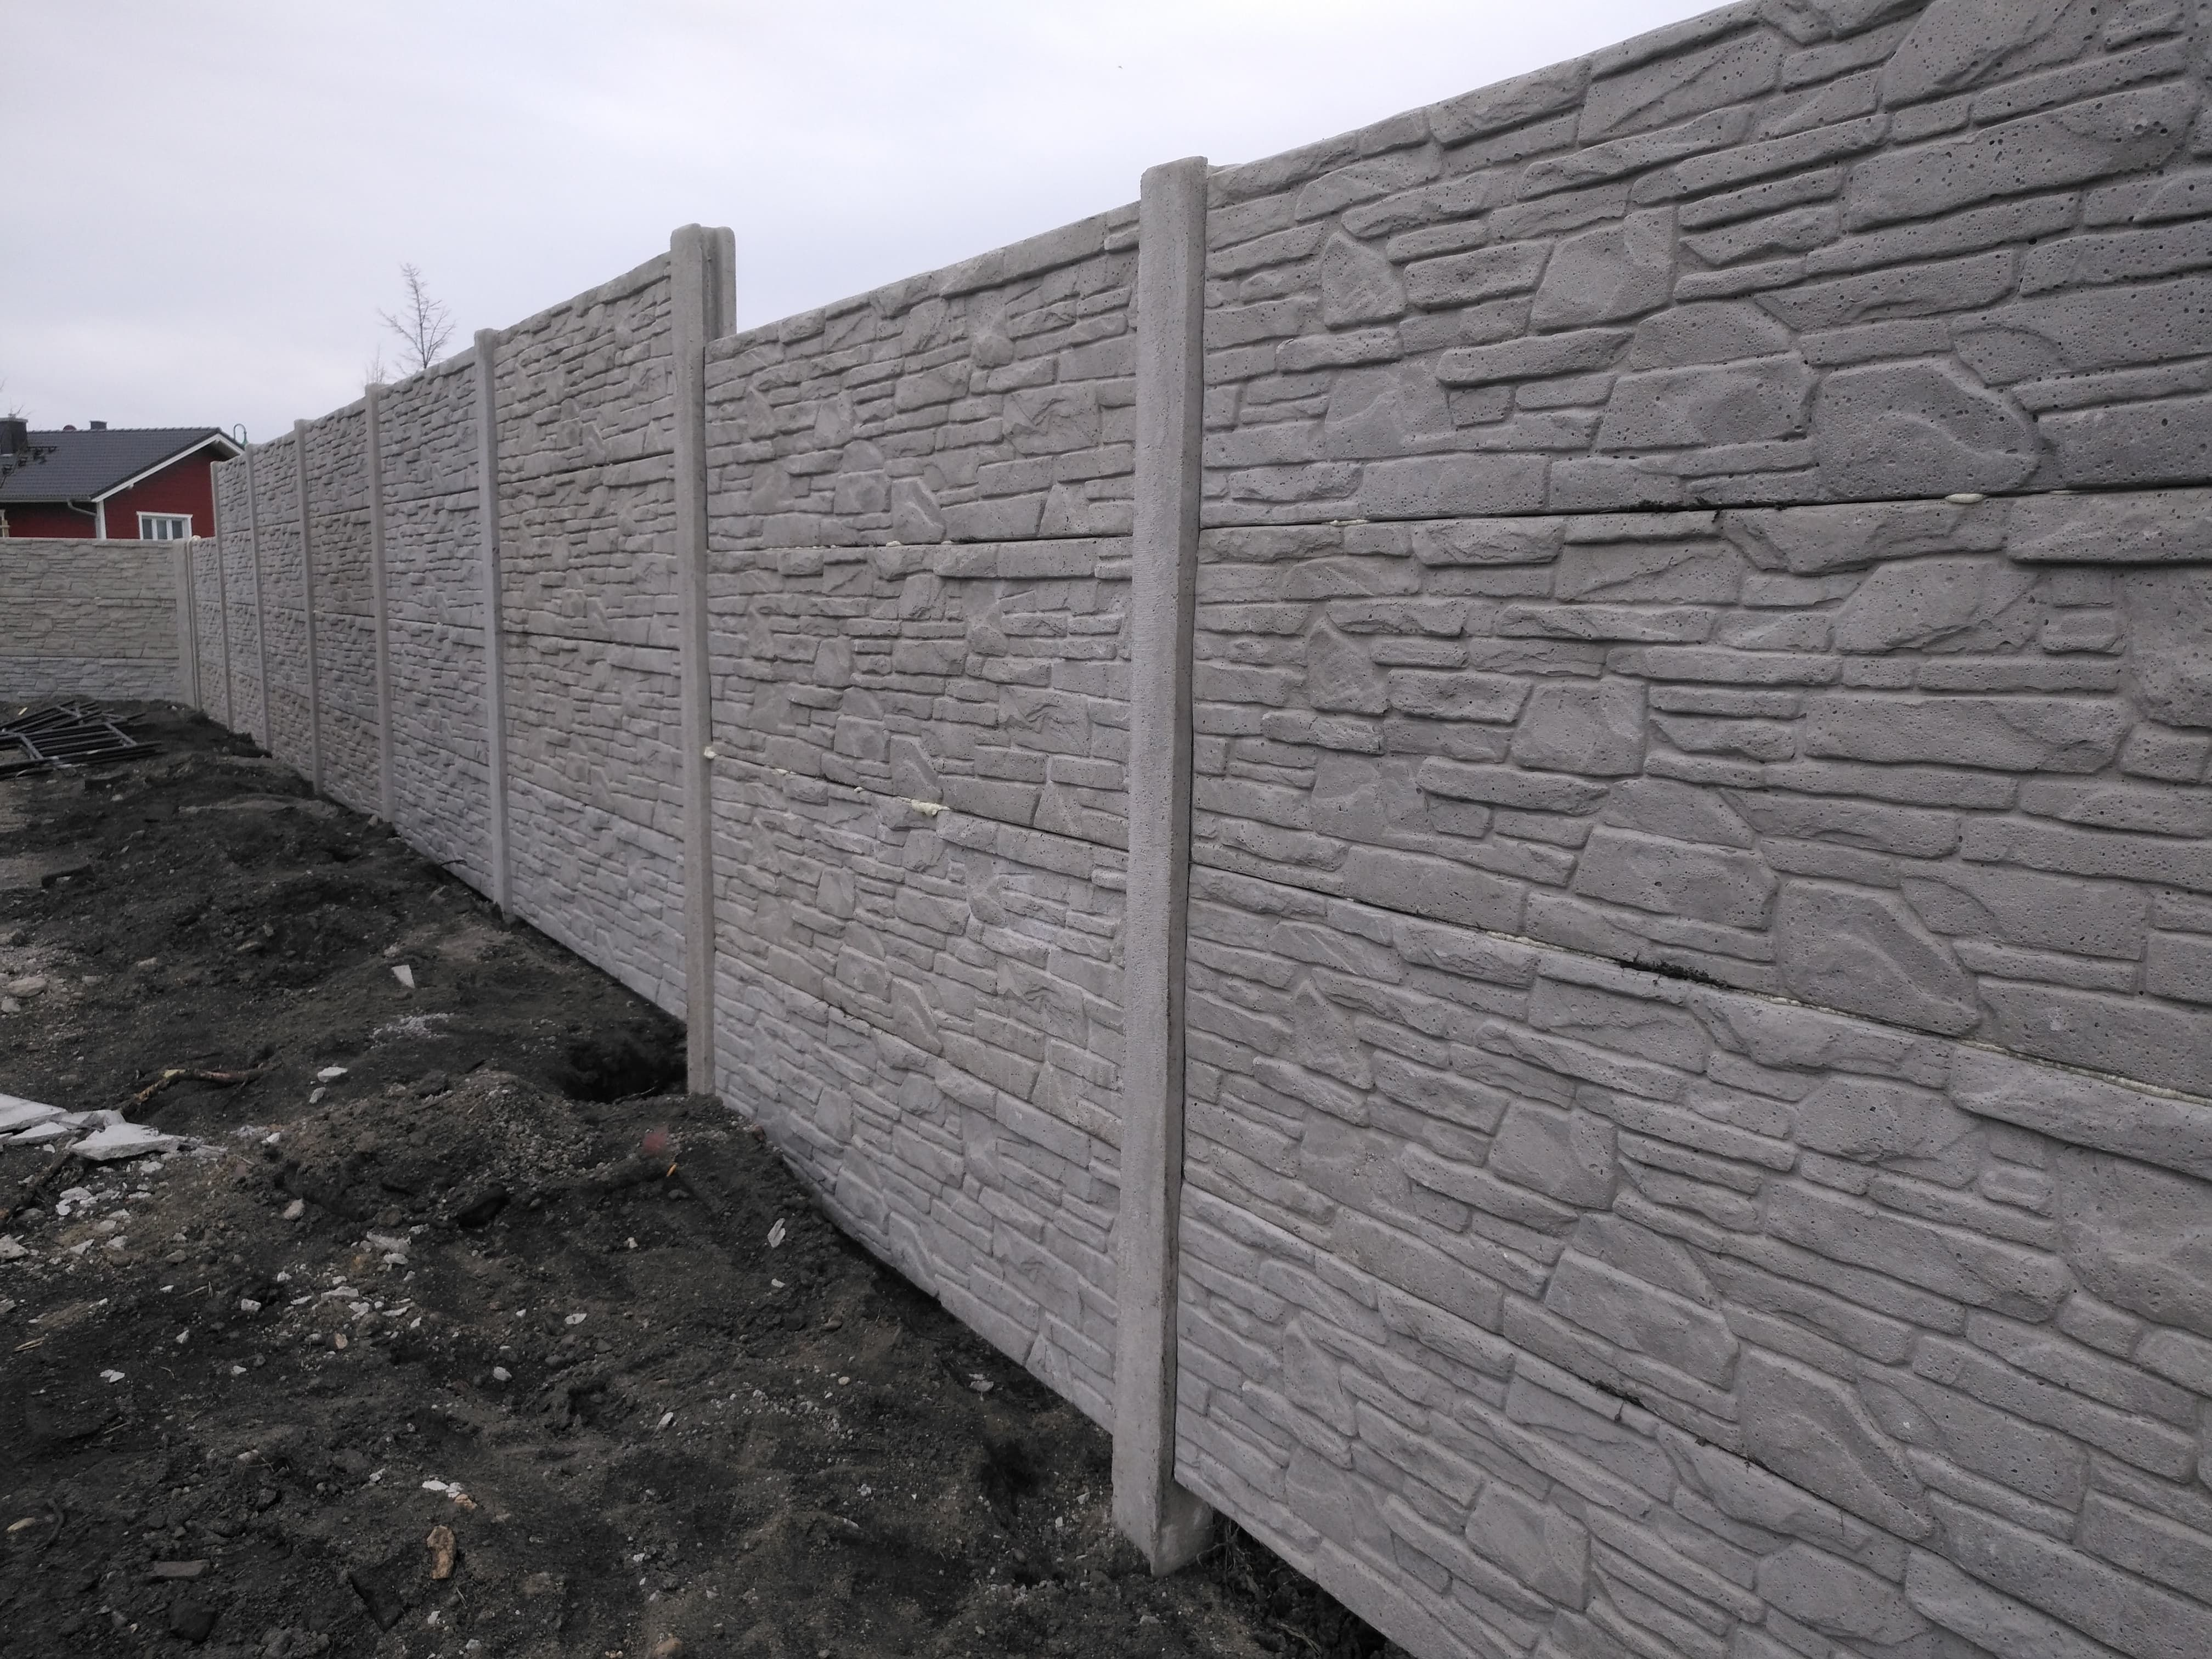 Zaun 20 M hoch   Betonzaun, Zäune aus polen, Betonplatten